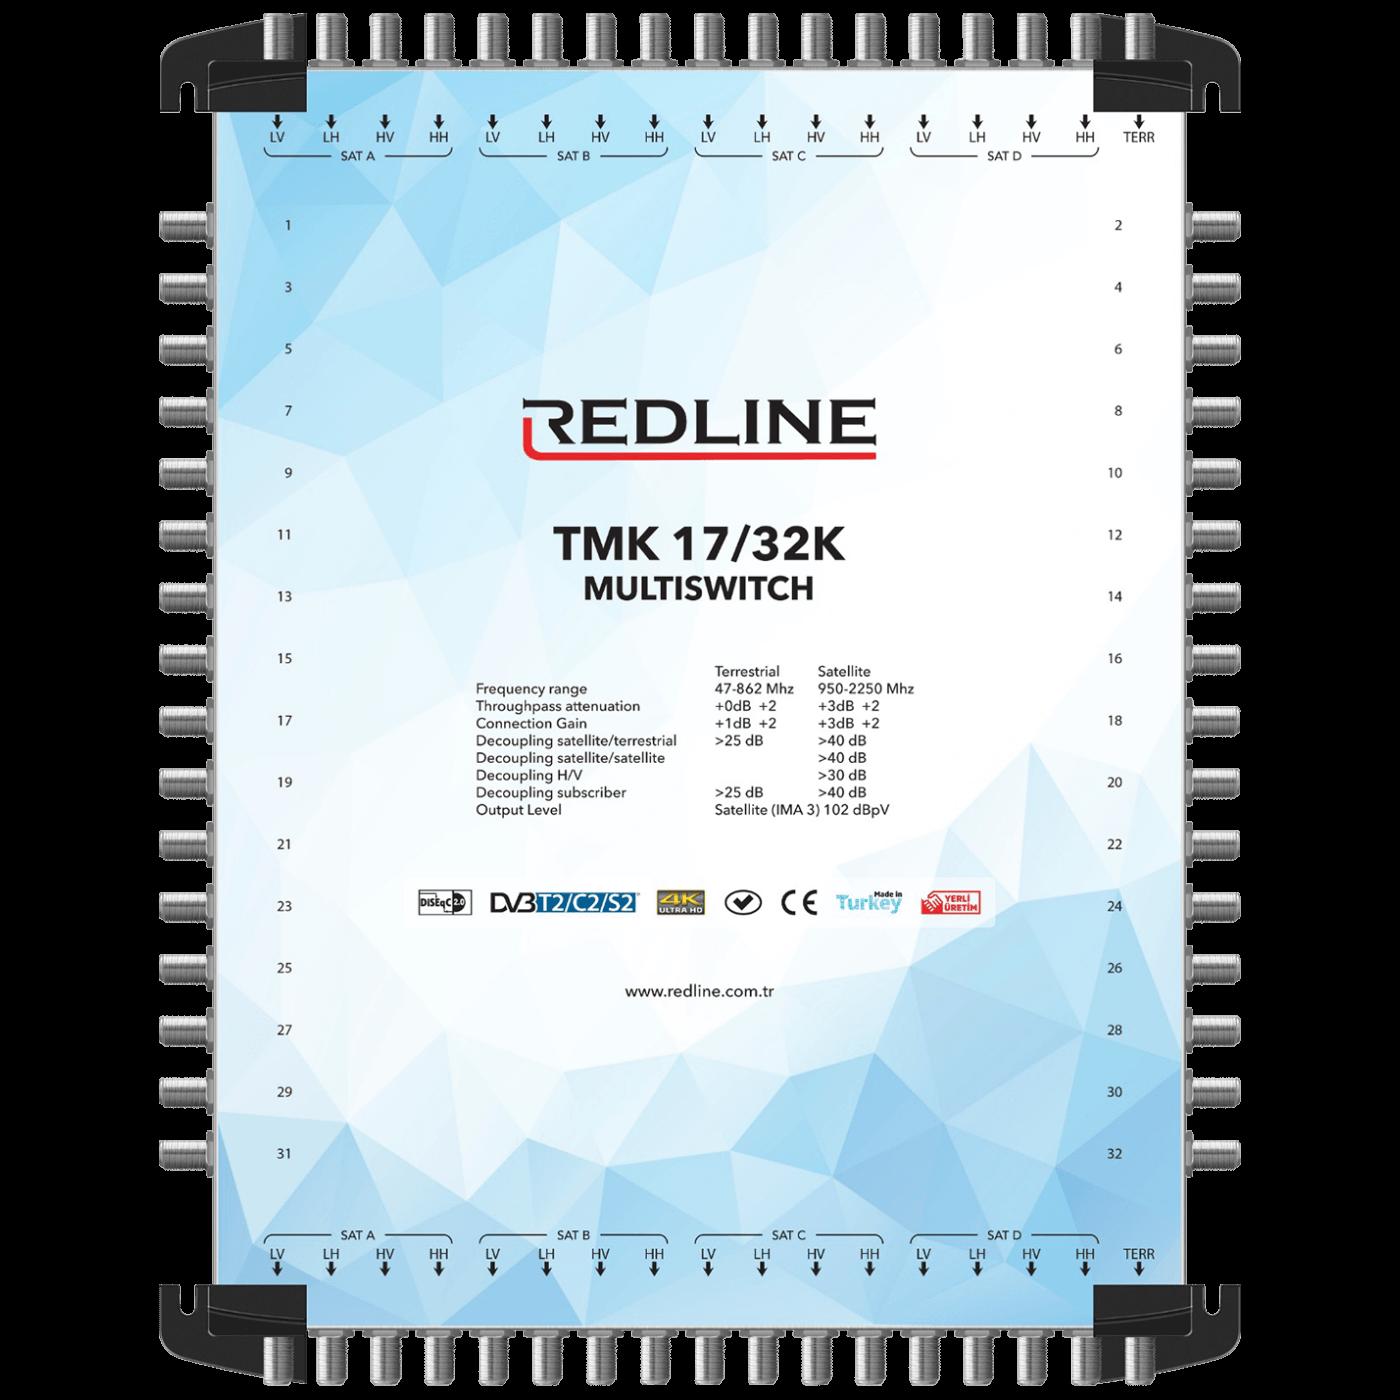 REDLINE - TMK 17/32K